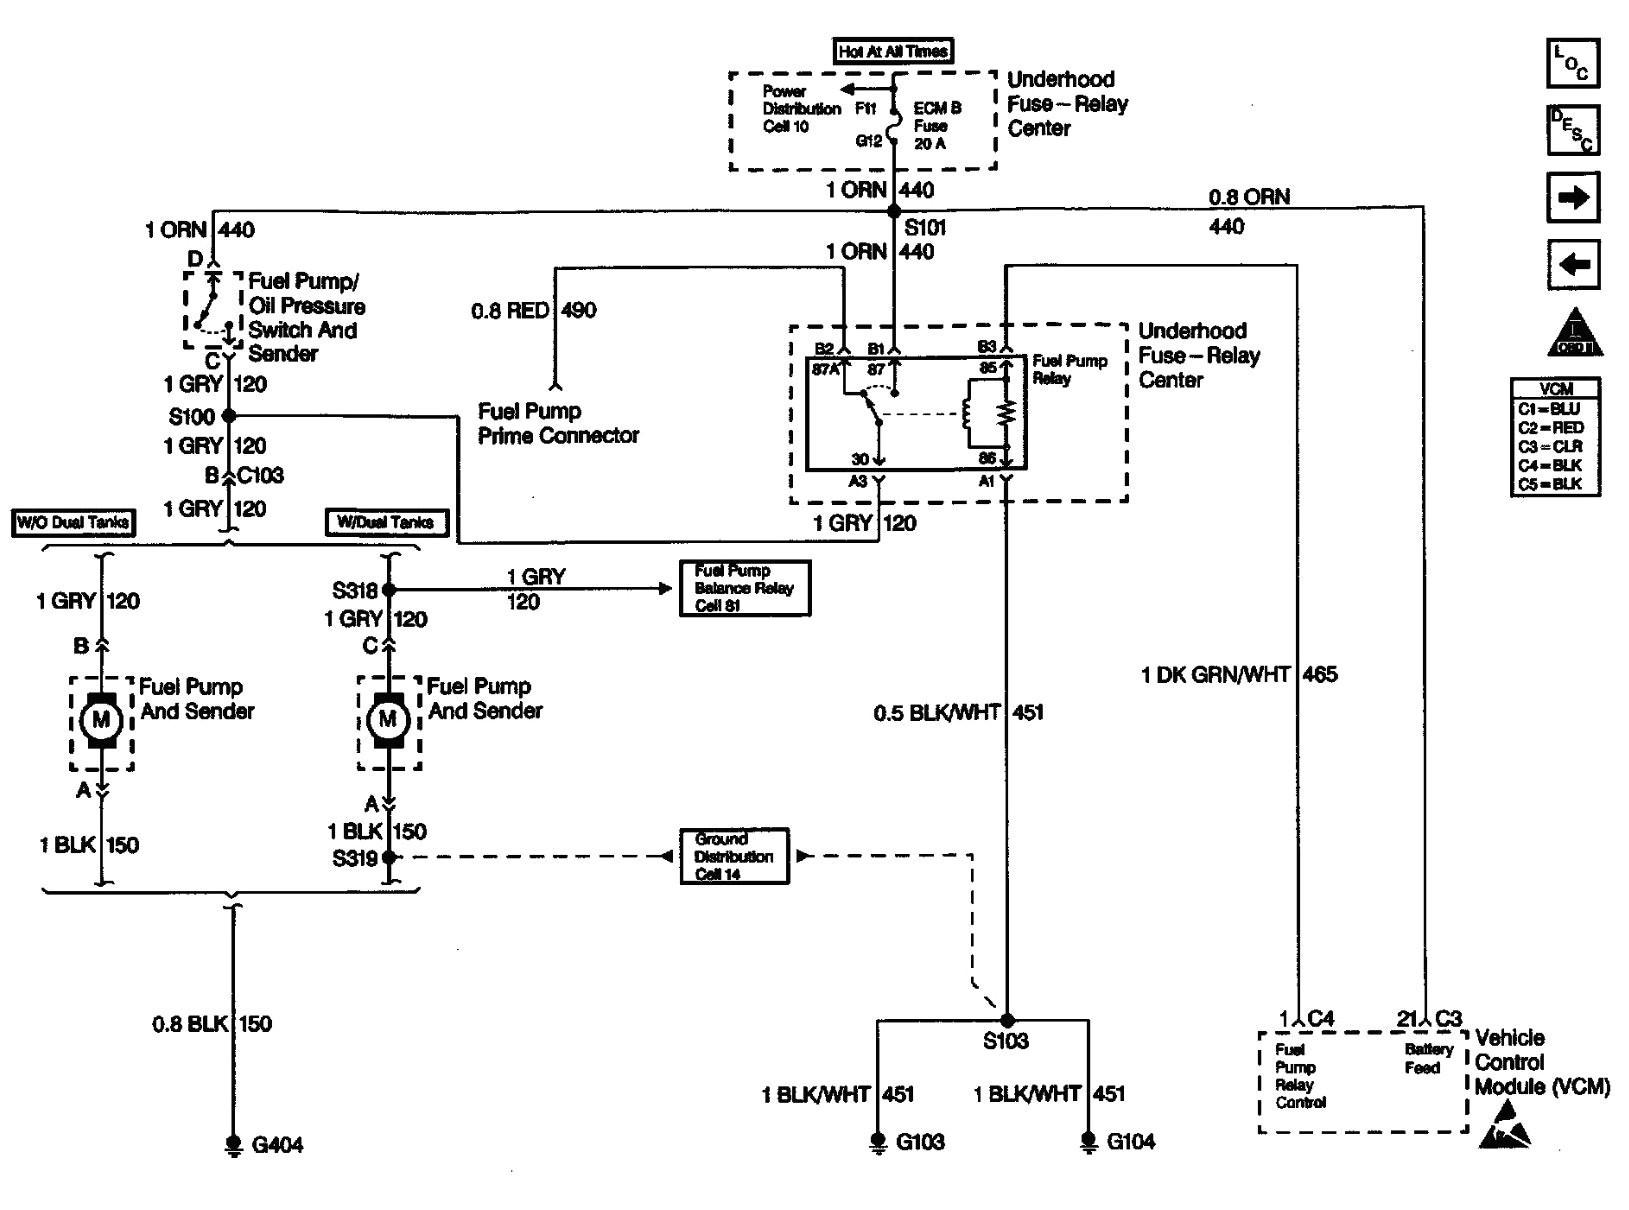 hight resolution of 1998 chevrolet 5 0 wiring harness breakdown wiring diagrams posts 1998 chevrolet 5 0 wiring harness breakdown